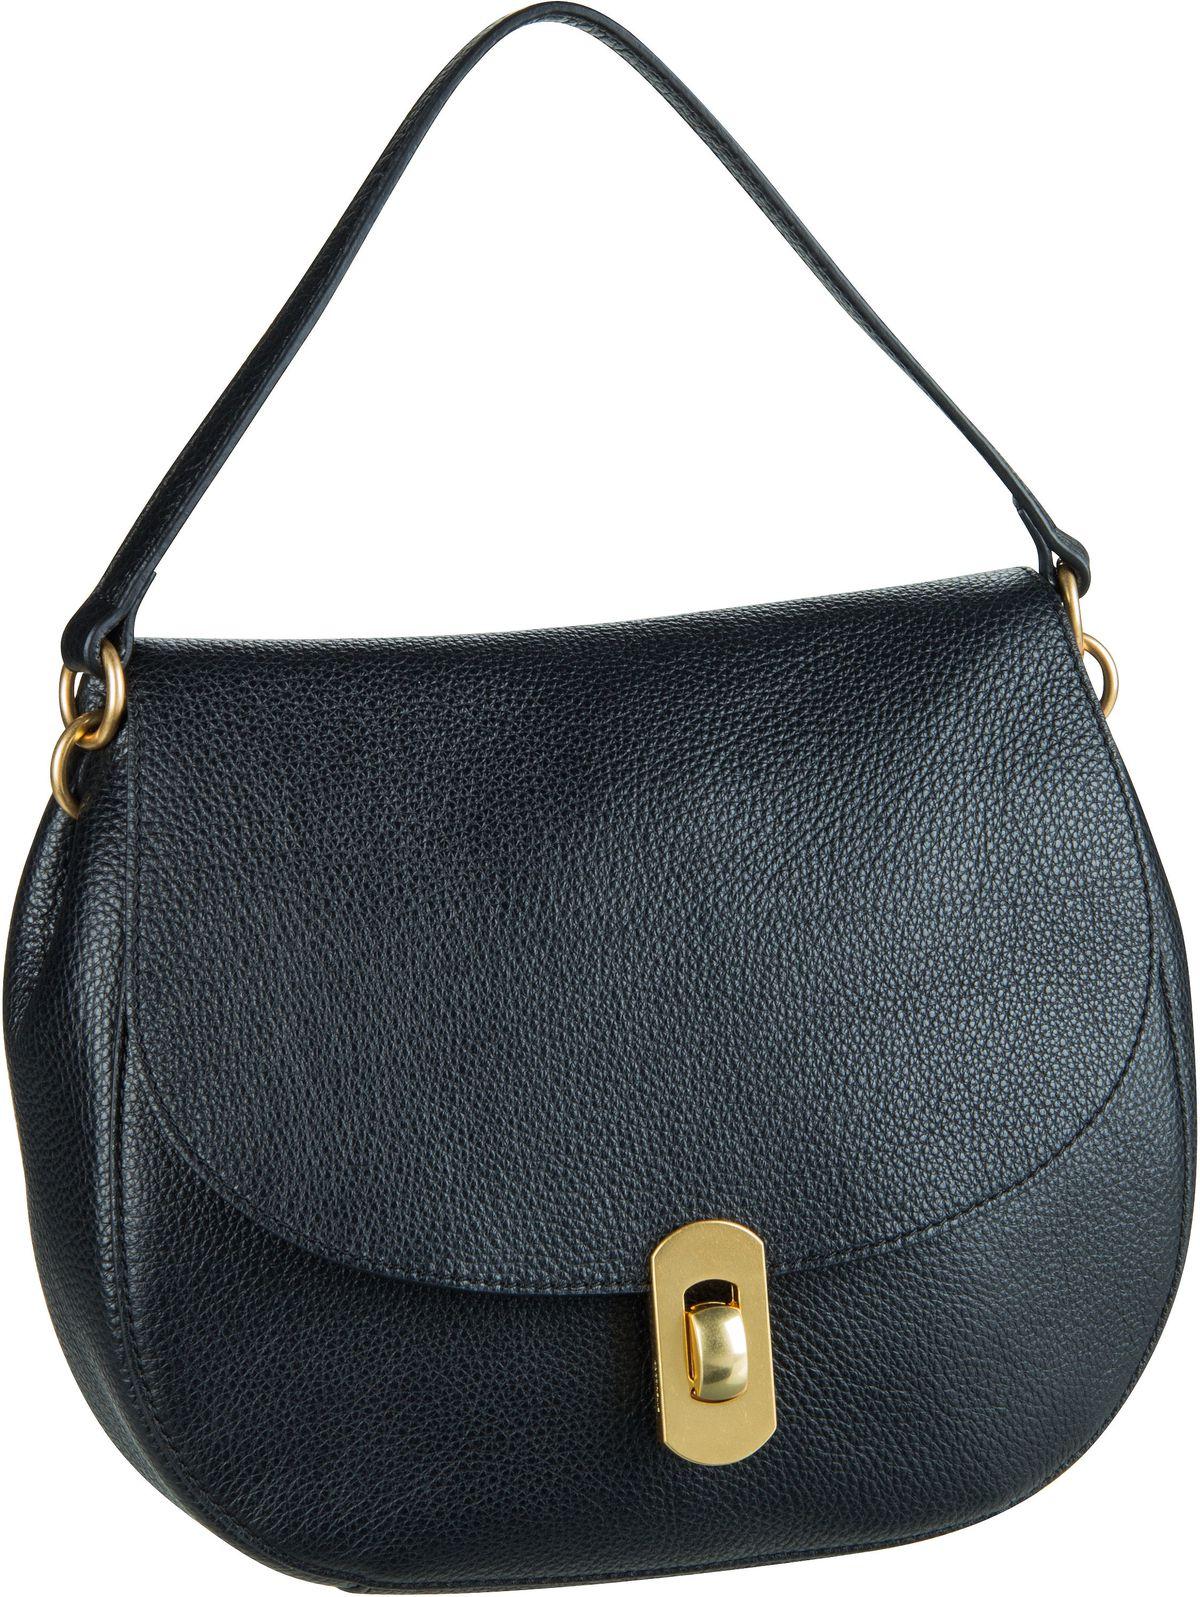 Handtasche Zaniah 1501 Nero